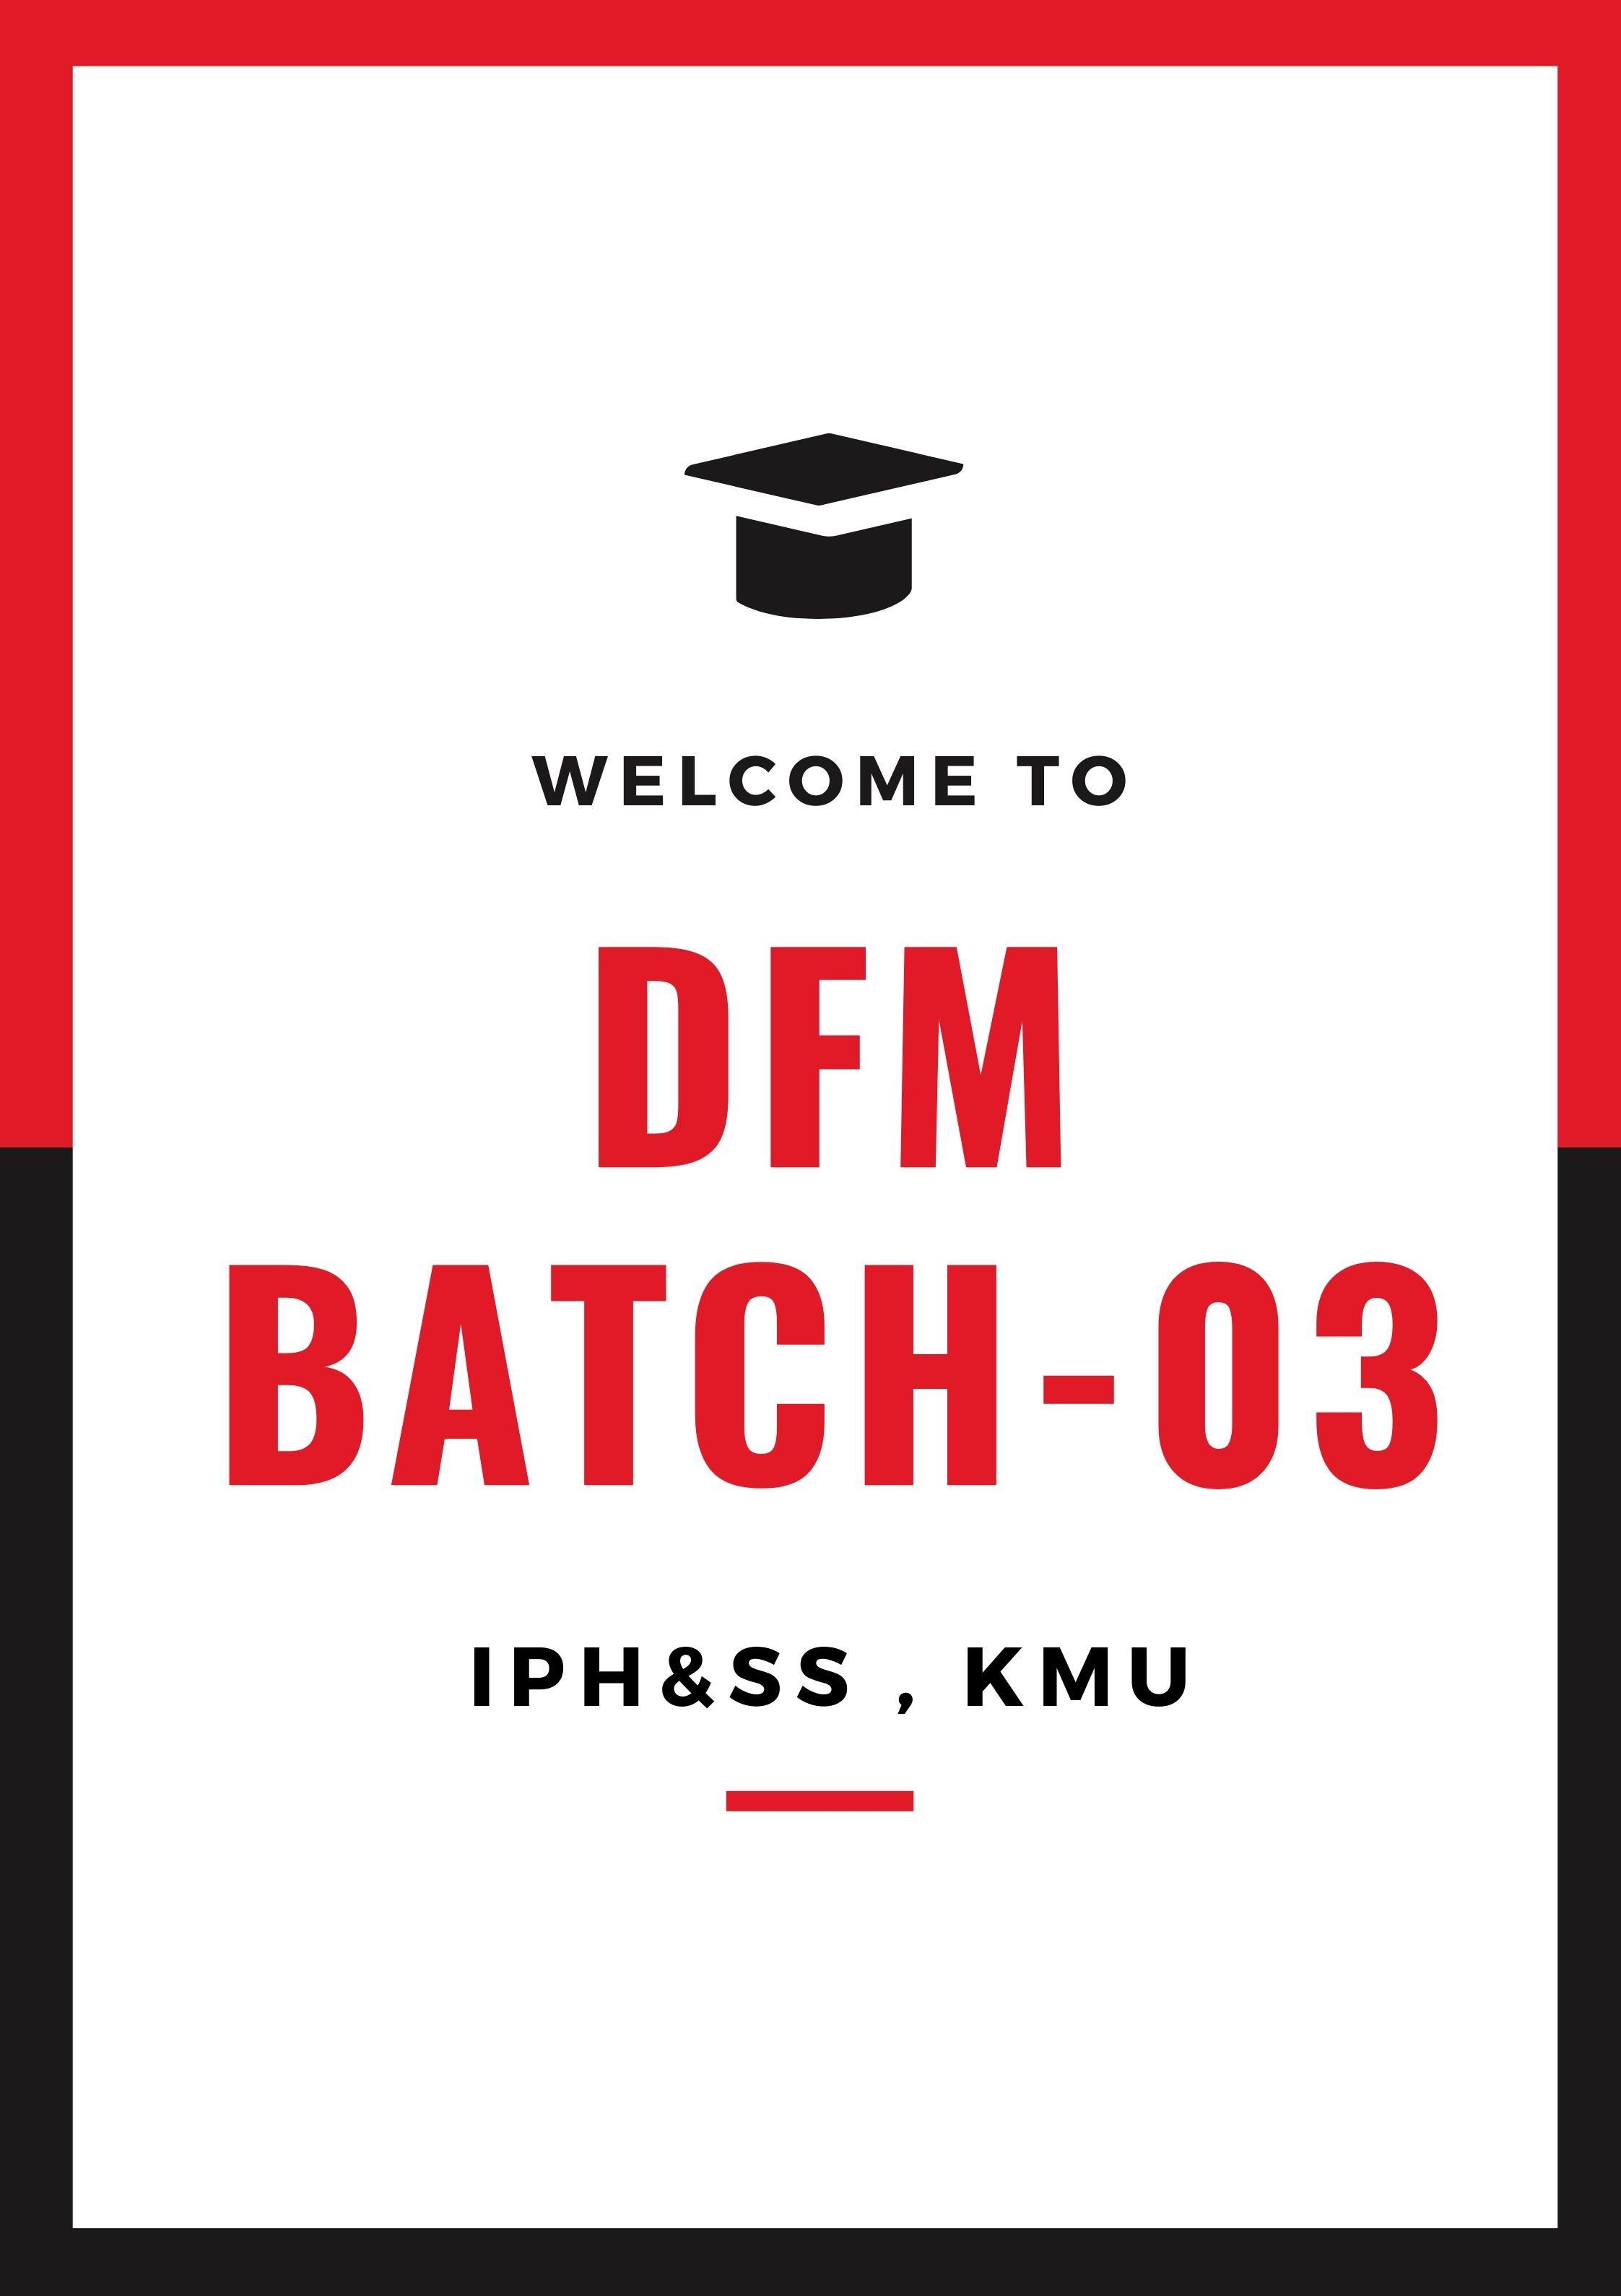 Diploma in Family Medicine Batch 03 Fall 2020